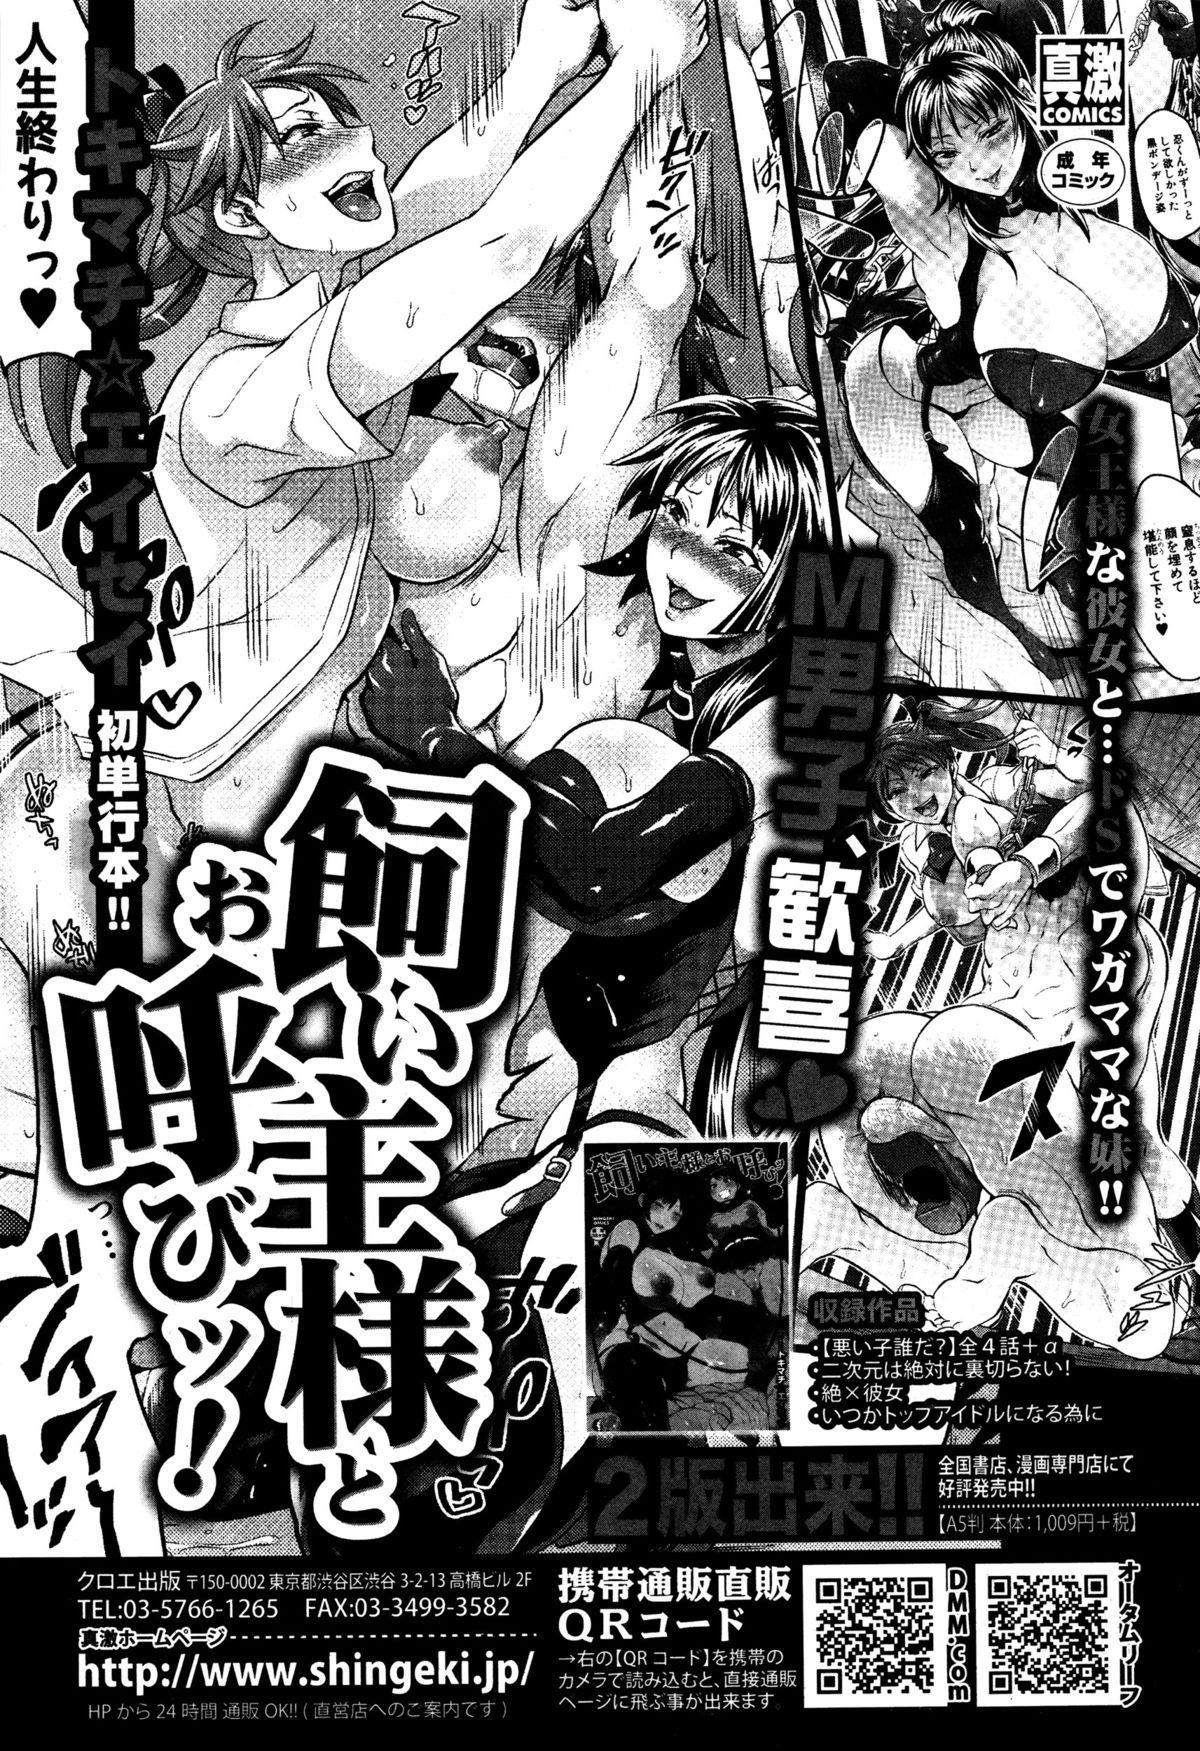 COMIC Shingeki 2016-01 218